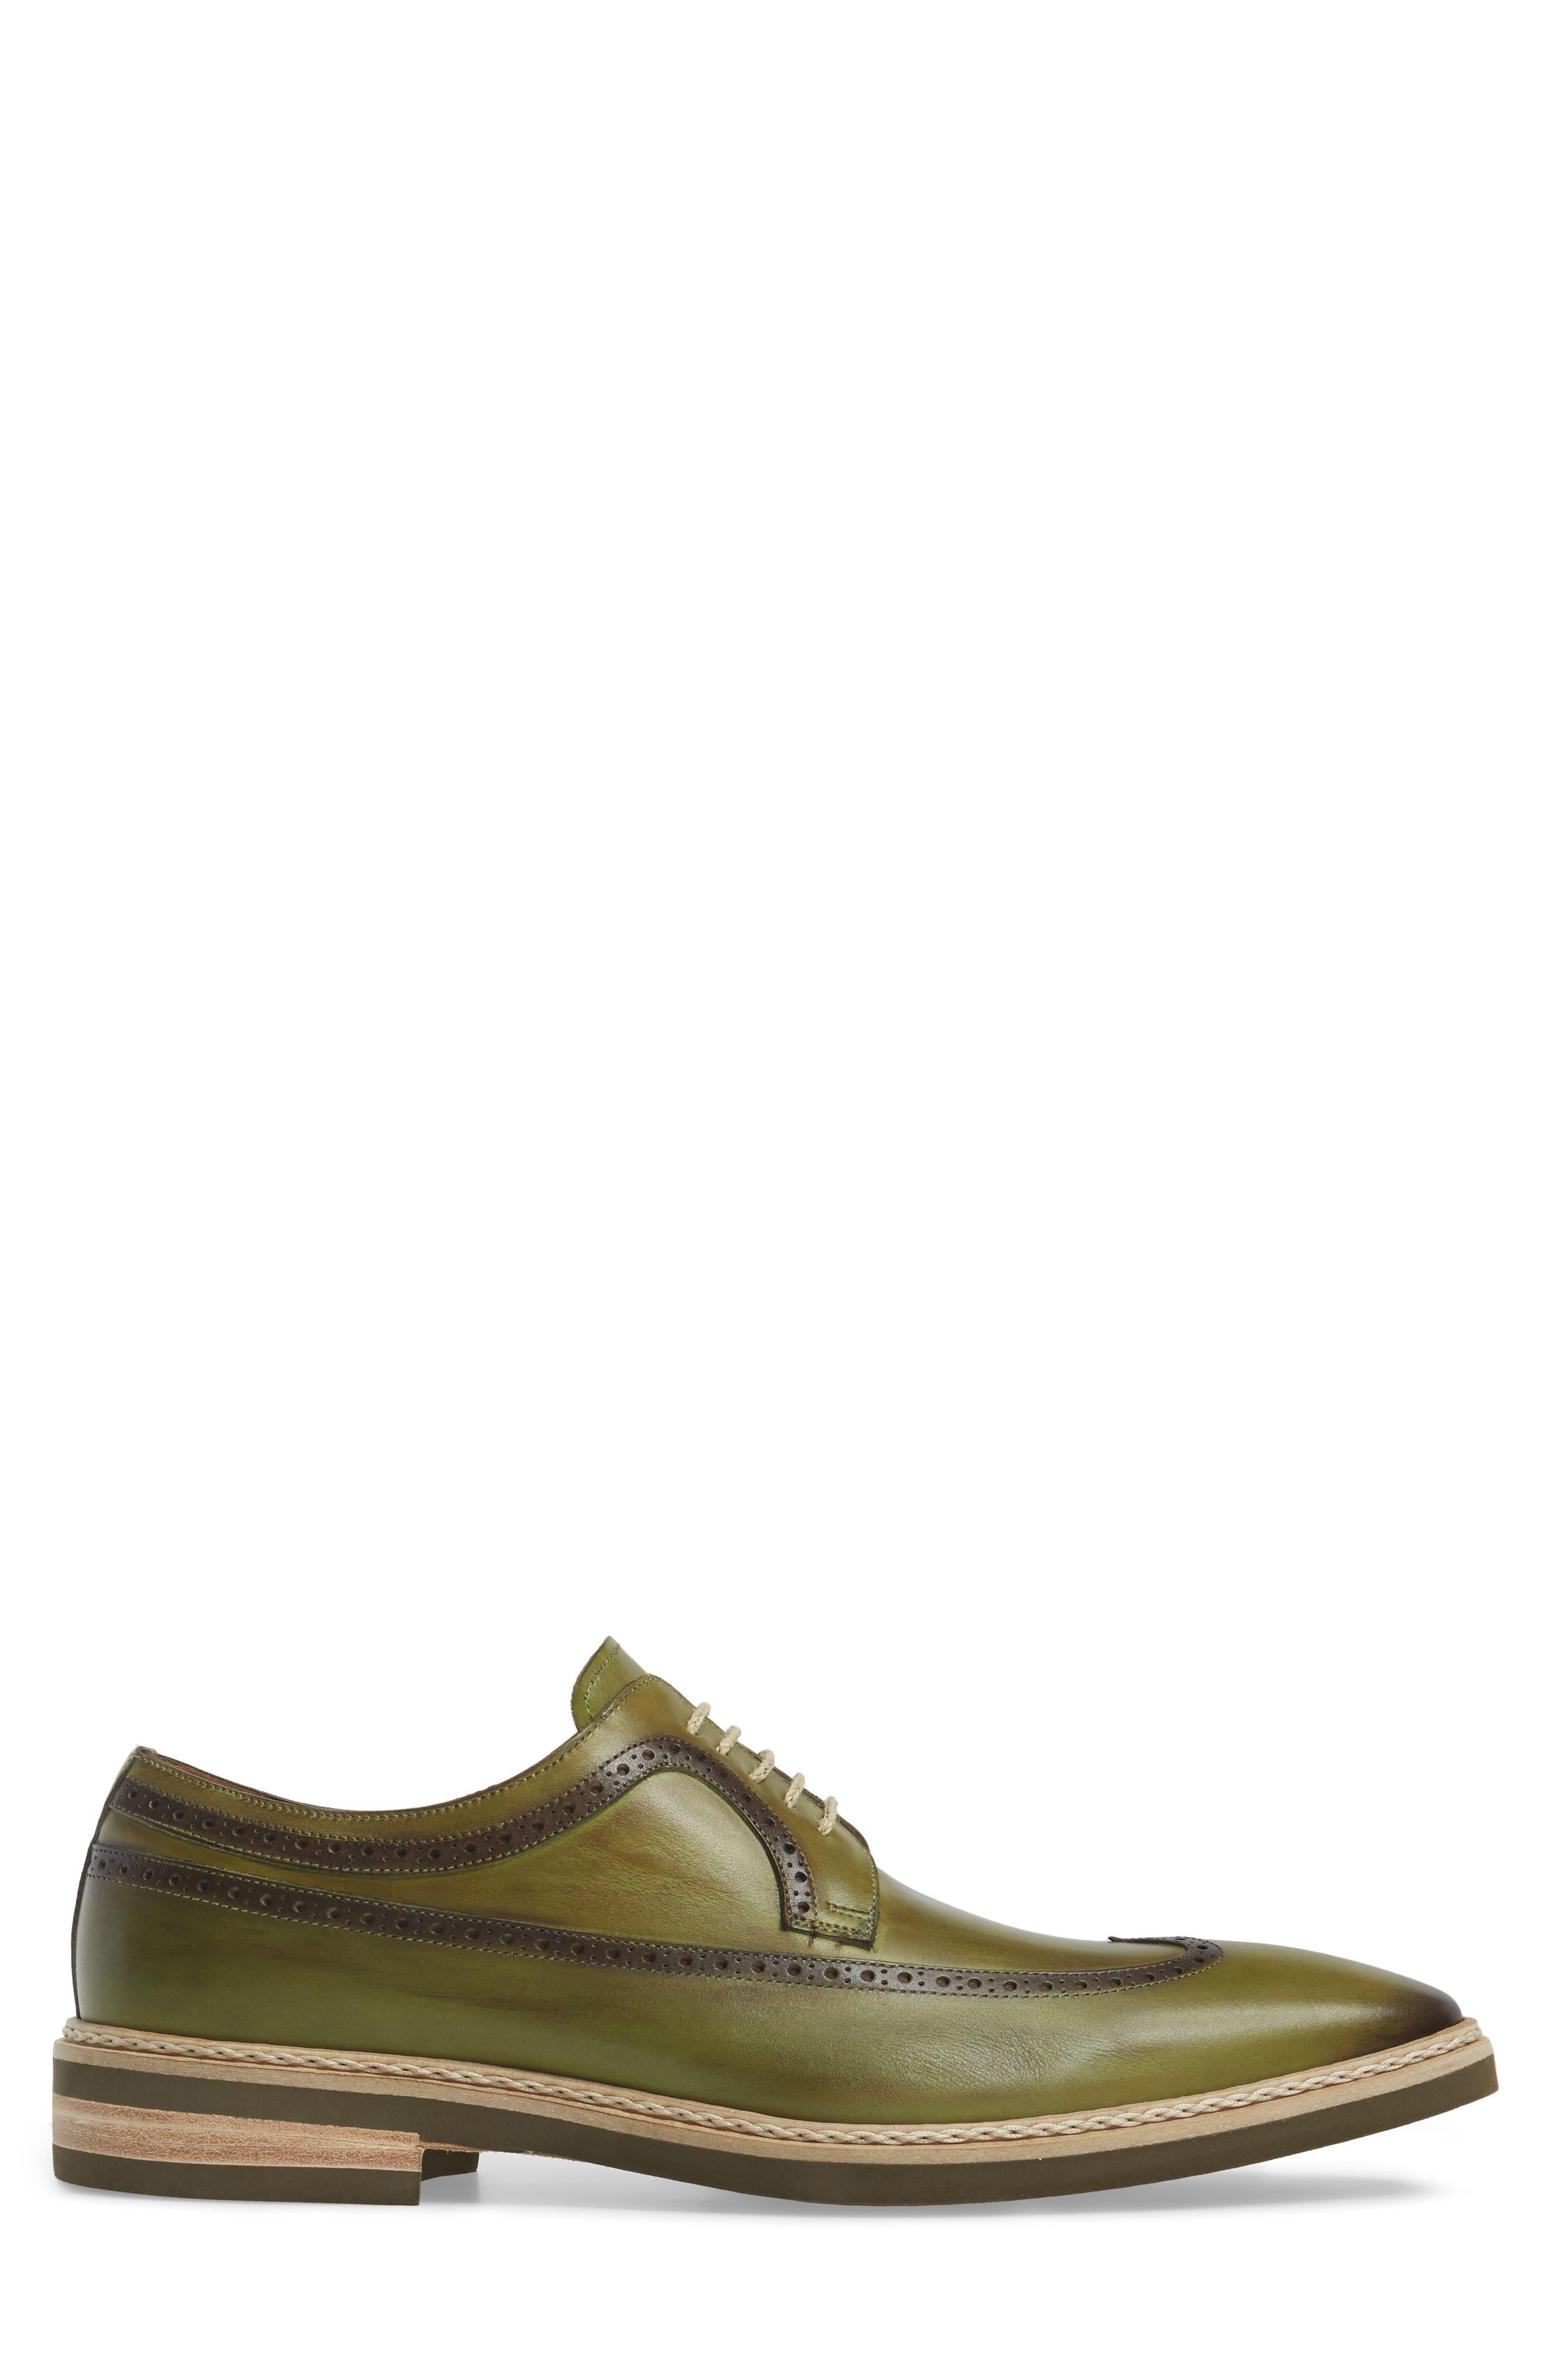 Maraval Wingtip,                             Alternate thumbnail 3, color,                             Olive Leather